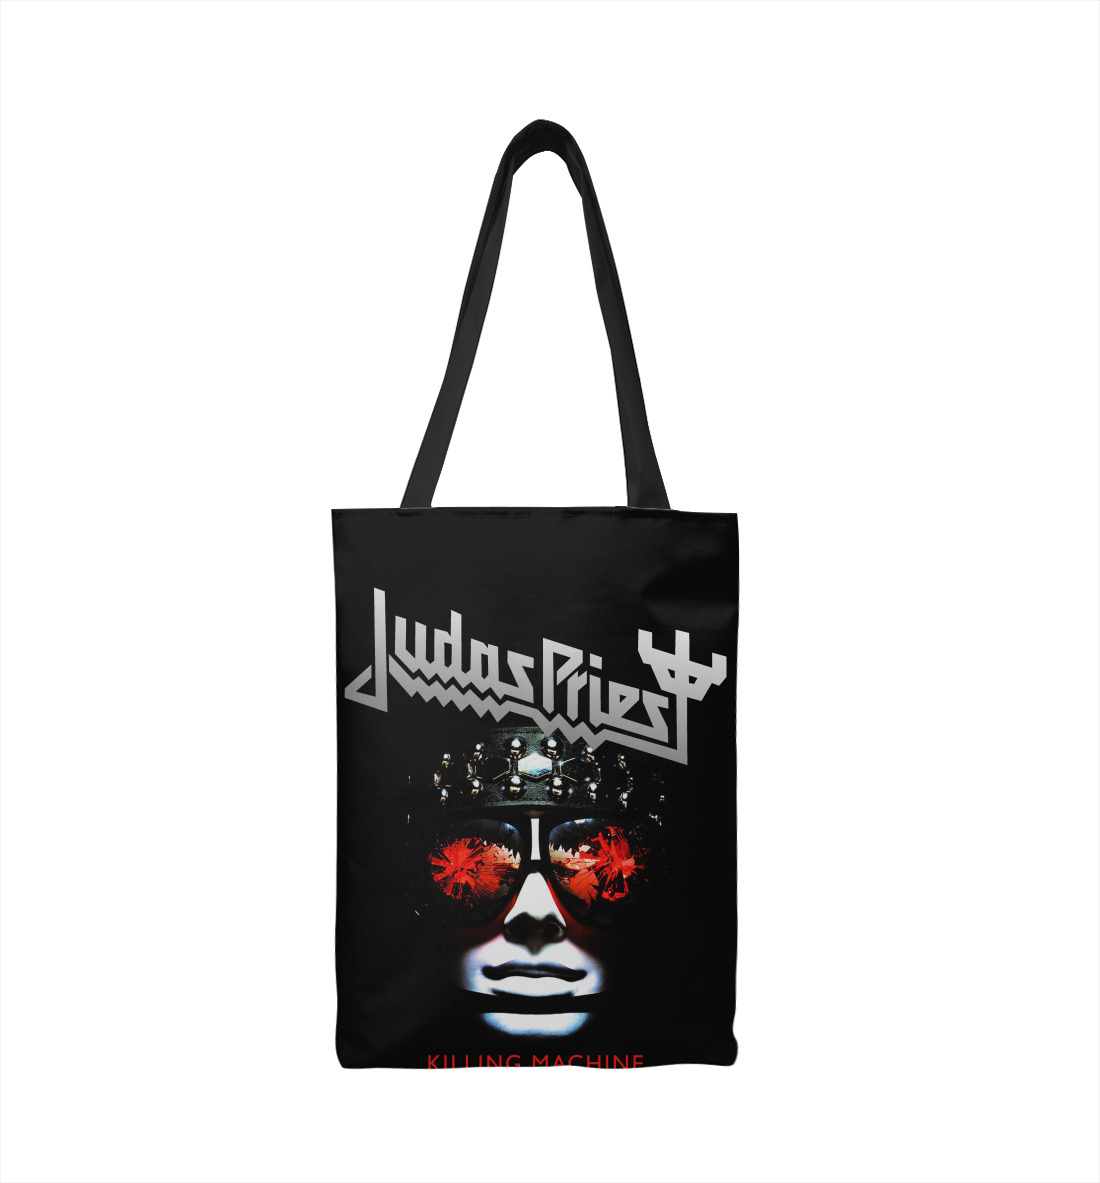 Judas Priest priest